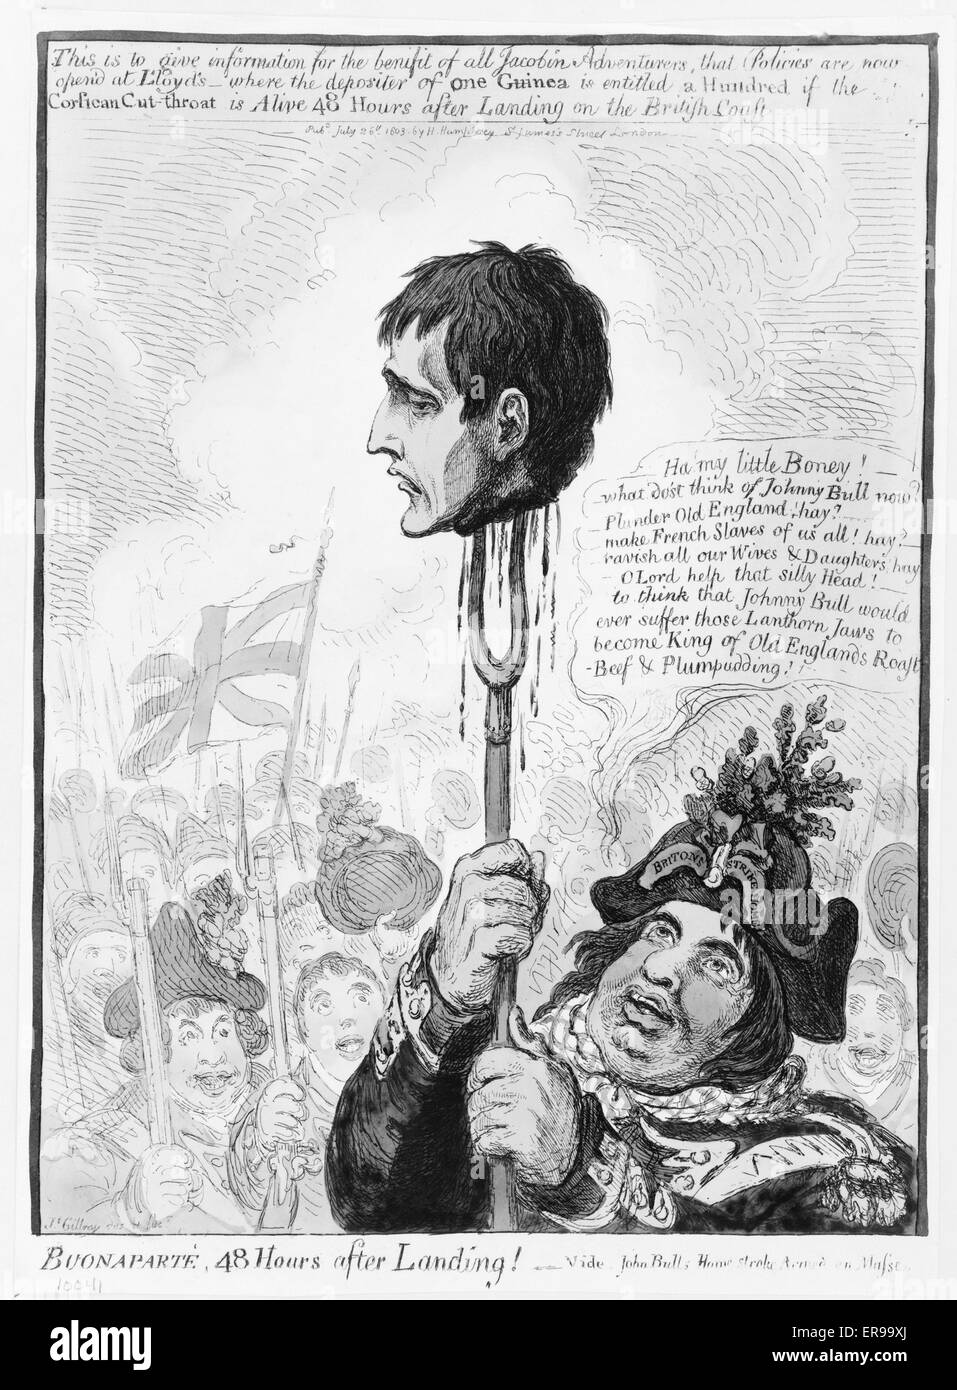 Buonaparte, 48 hours after landing!--Vide John Bulls home-stroke, armed en masse. Head of Napoleon dripping blood, Stock Photo